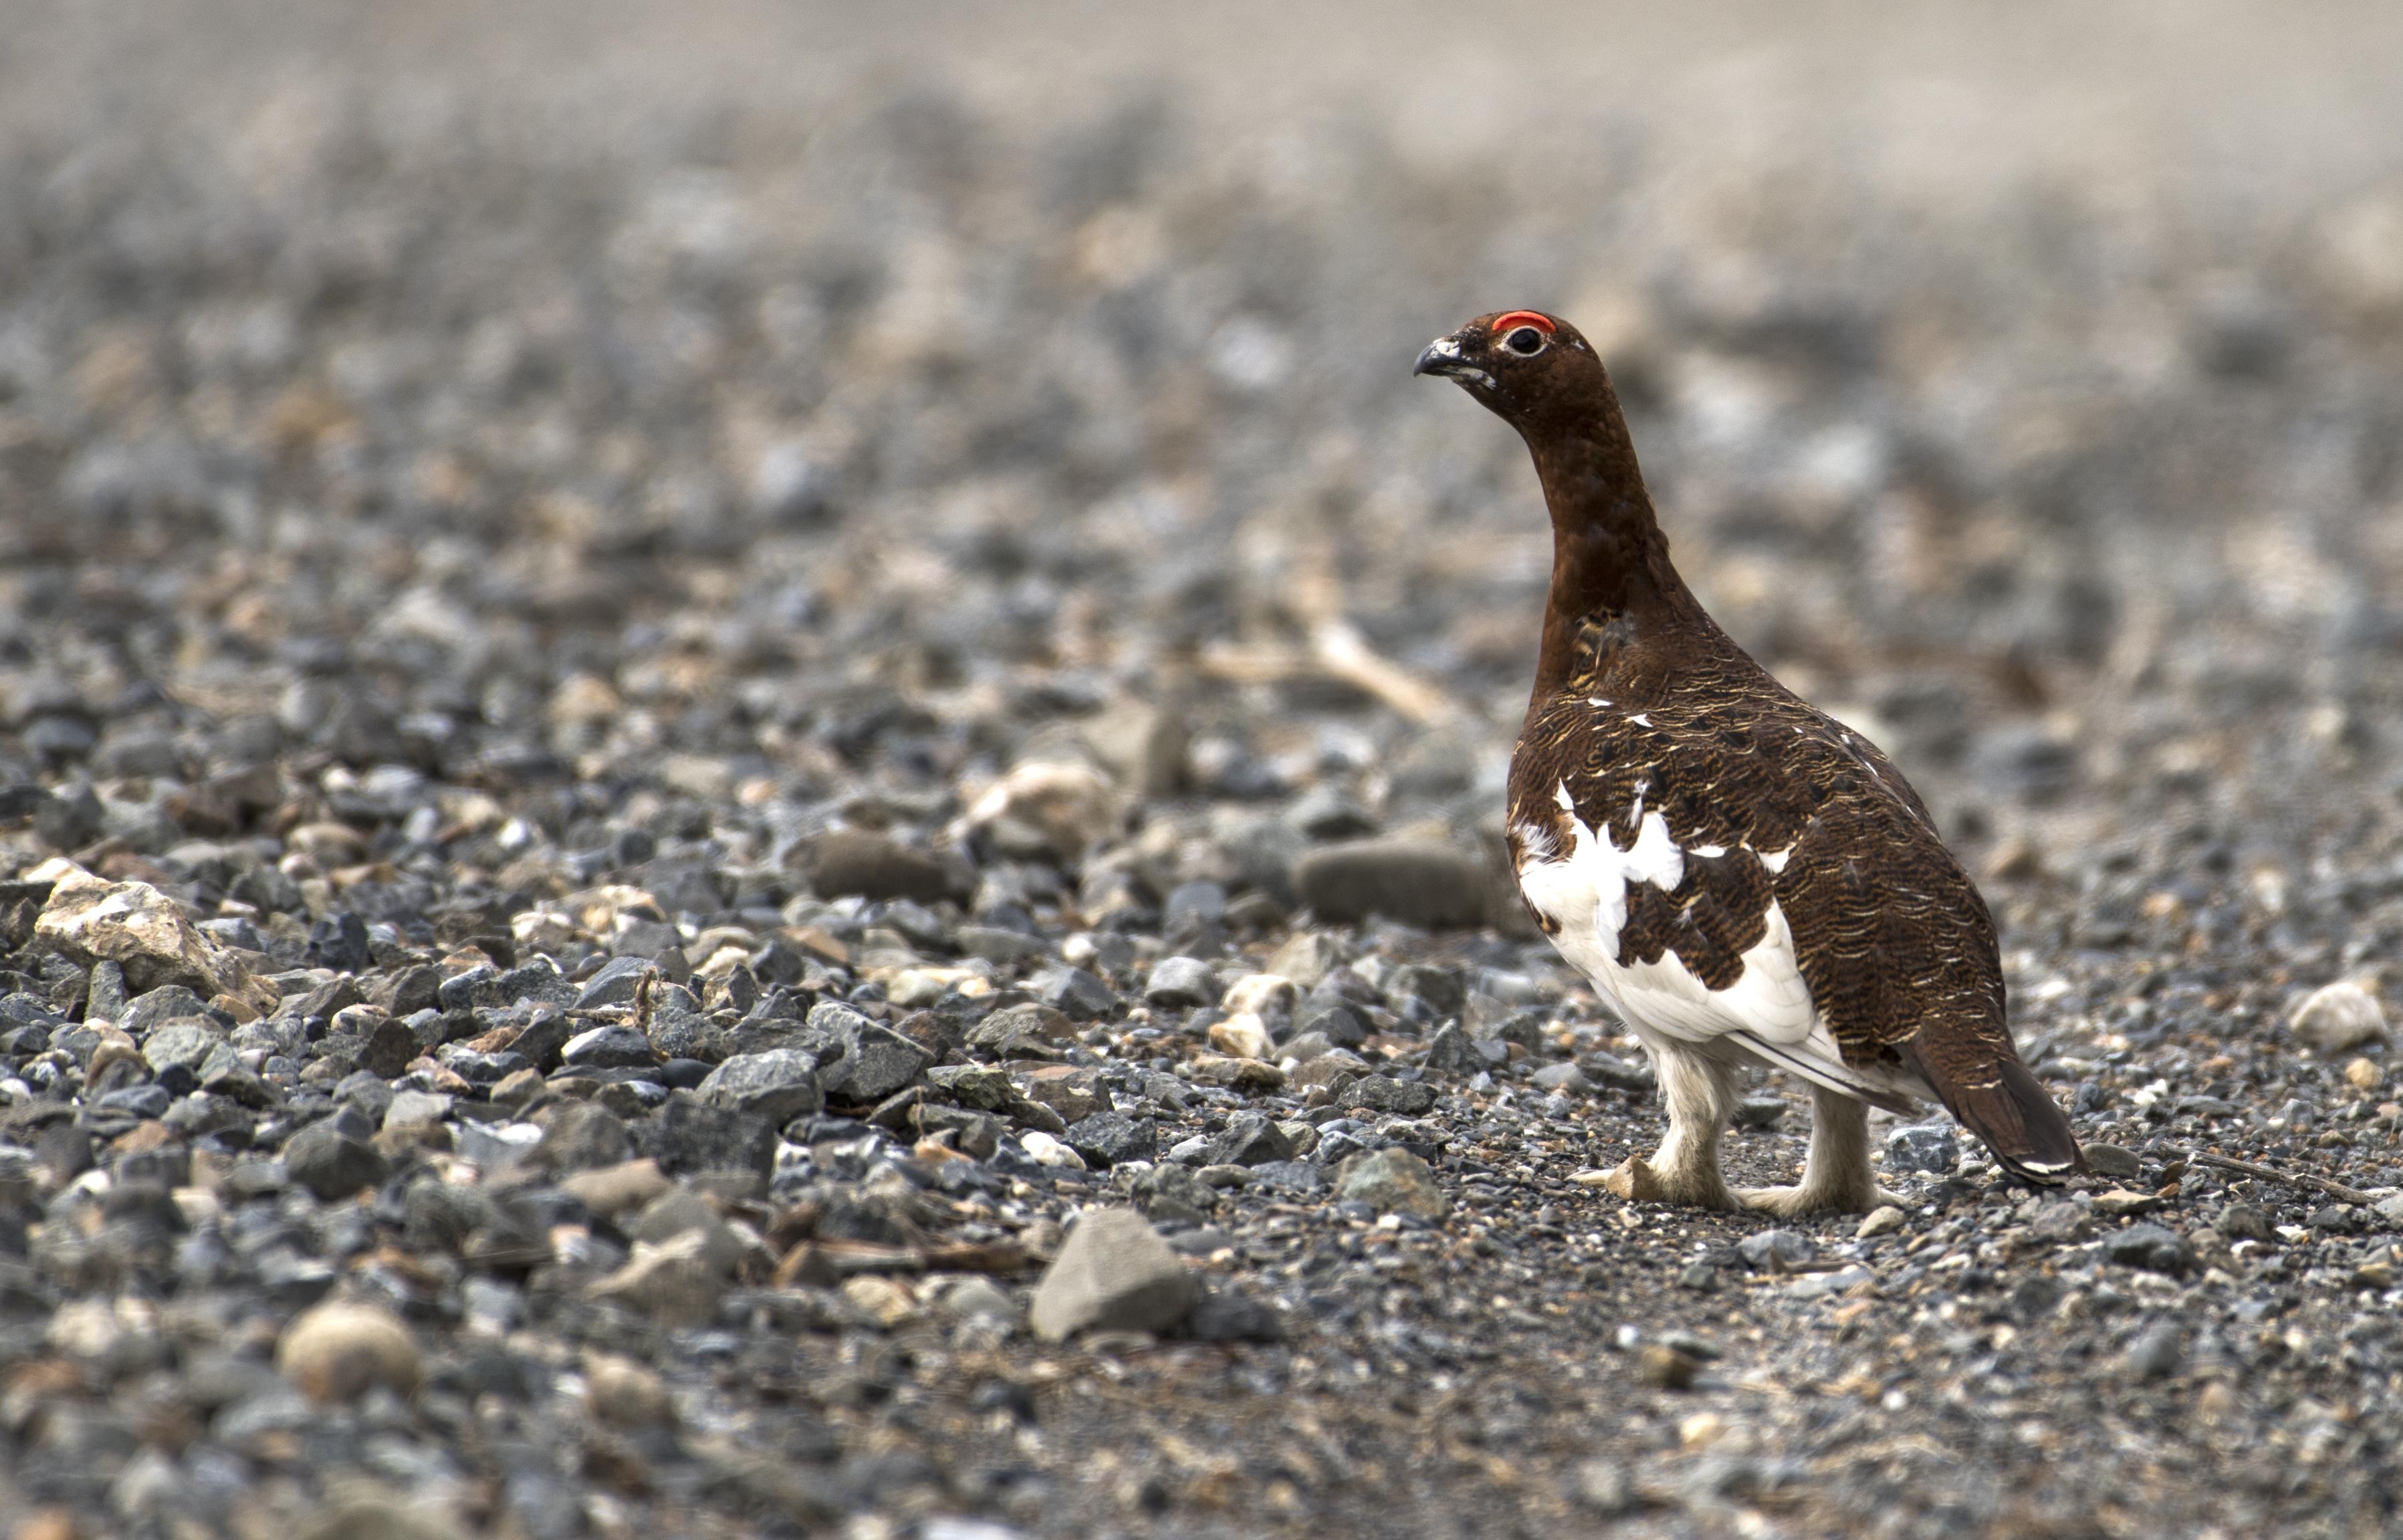 Bird stands on gravel roadside